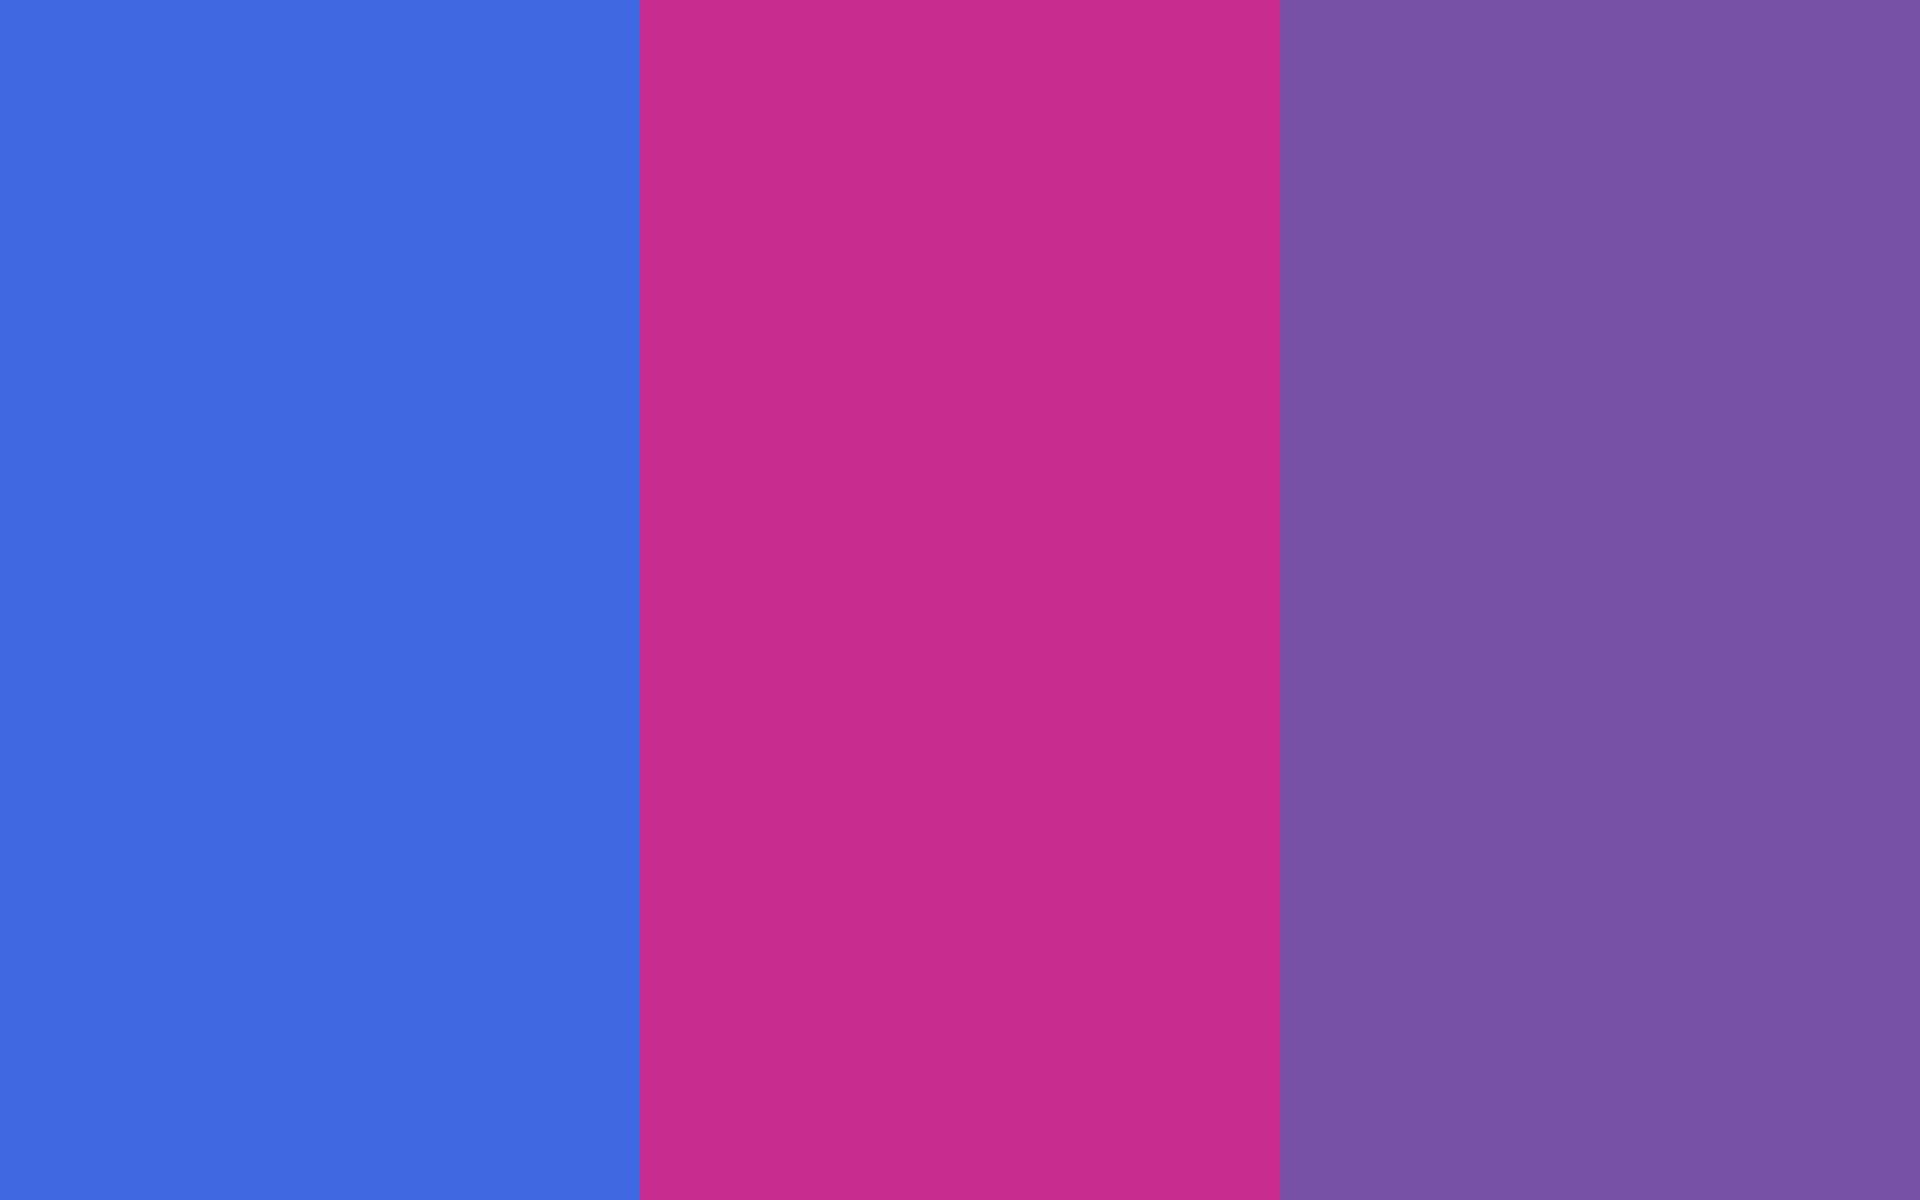 Royal Blue Web Royal Fuchsia and Royal Purple Three Color Background 1920x1200